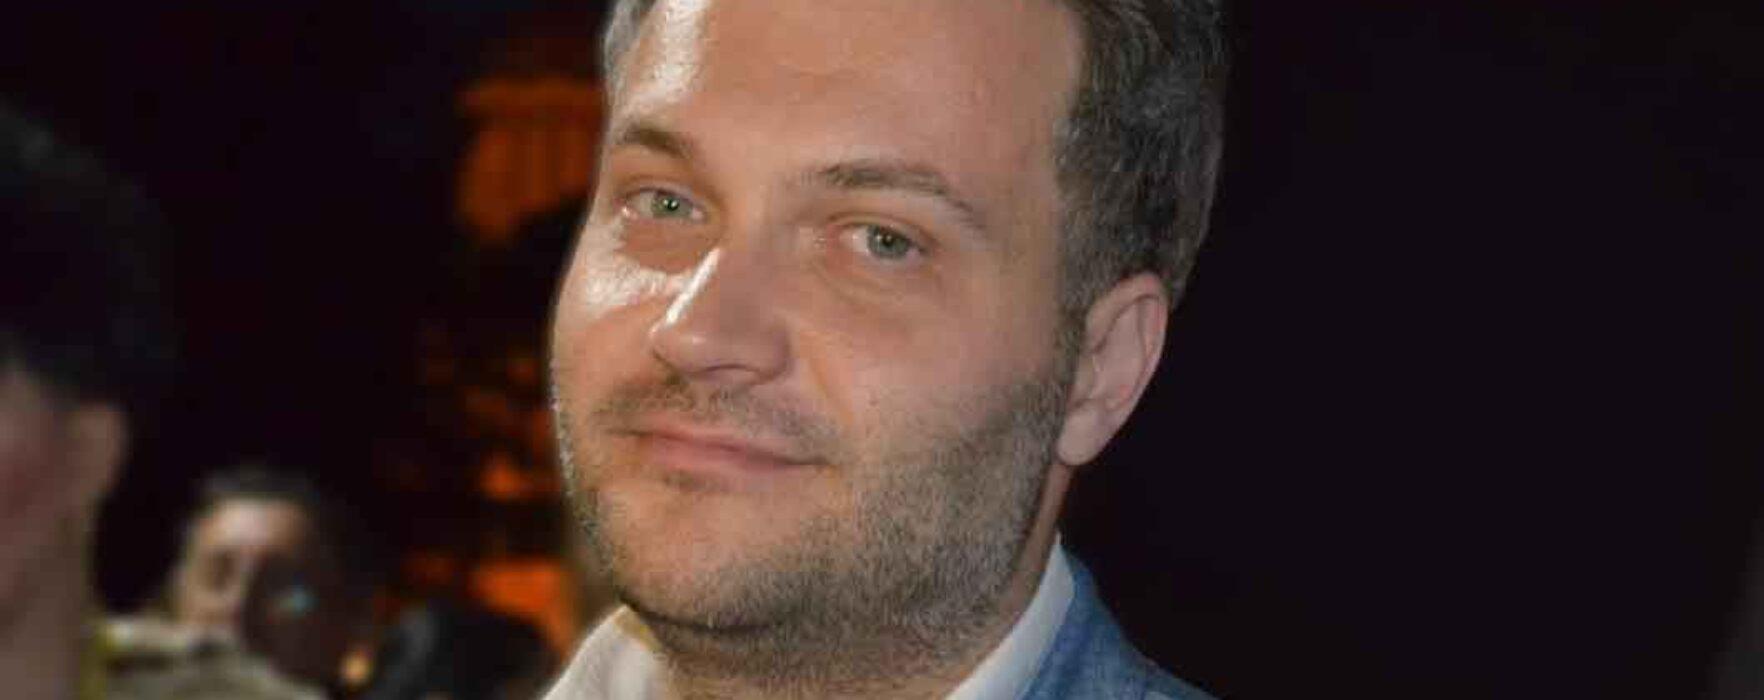 Fiul Rovanei Plumb, ales vicepreşedinte al PSD Dâmboviţa